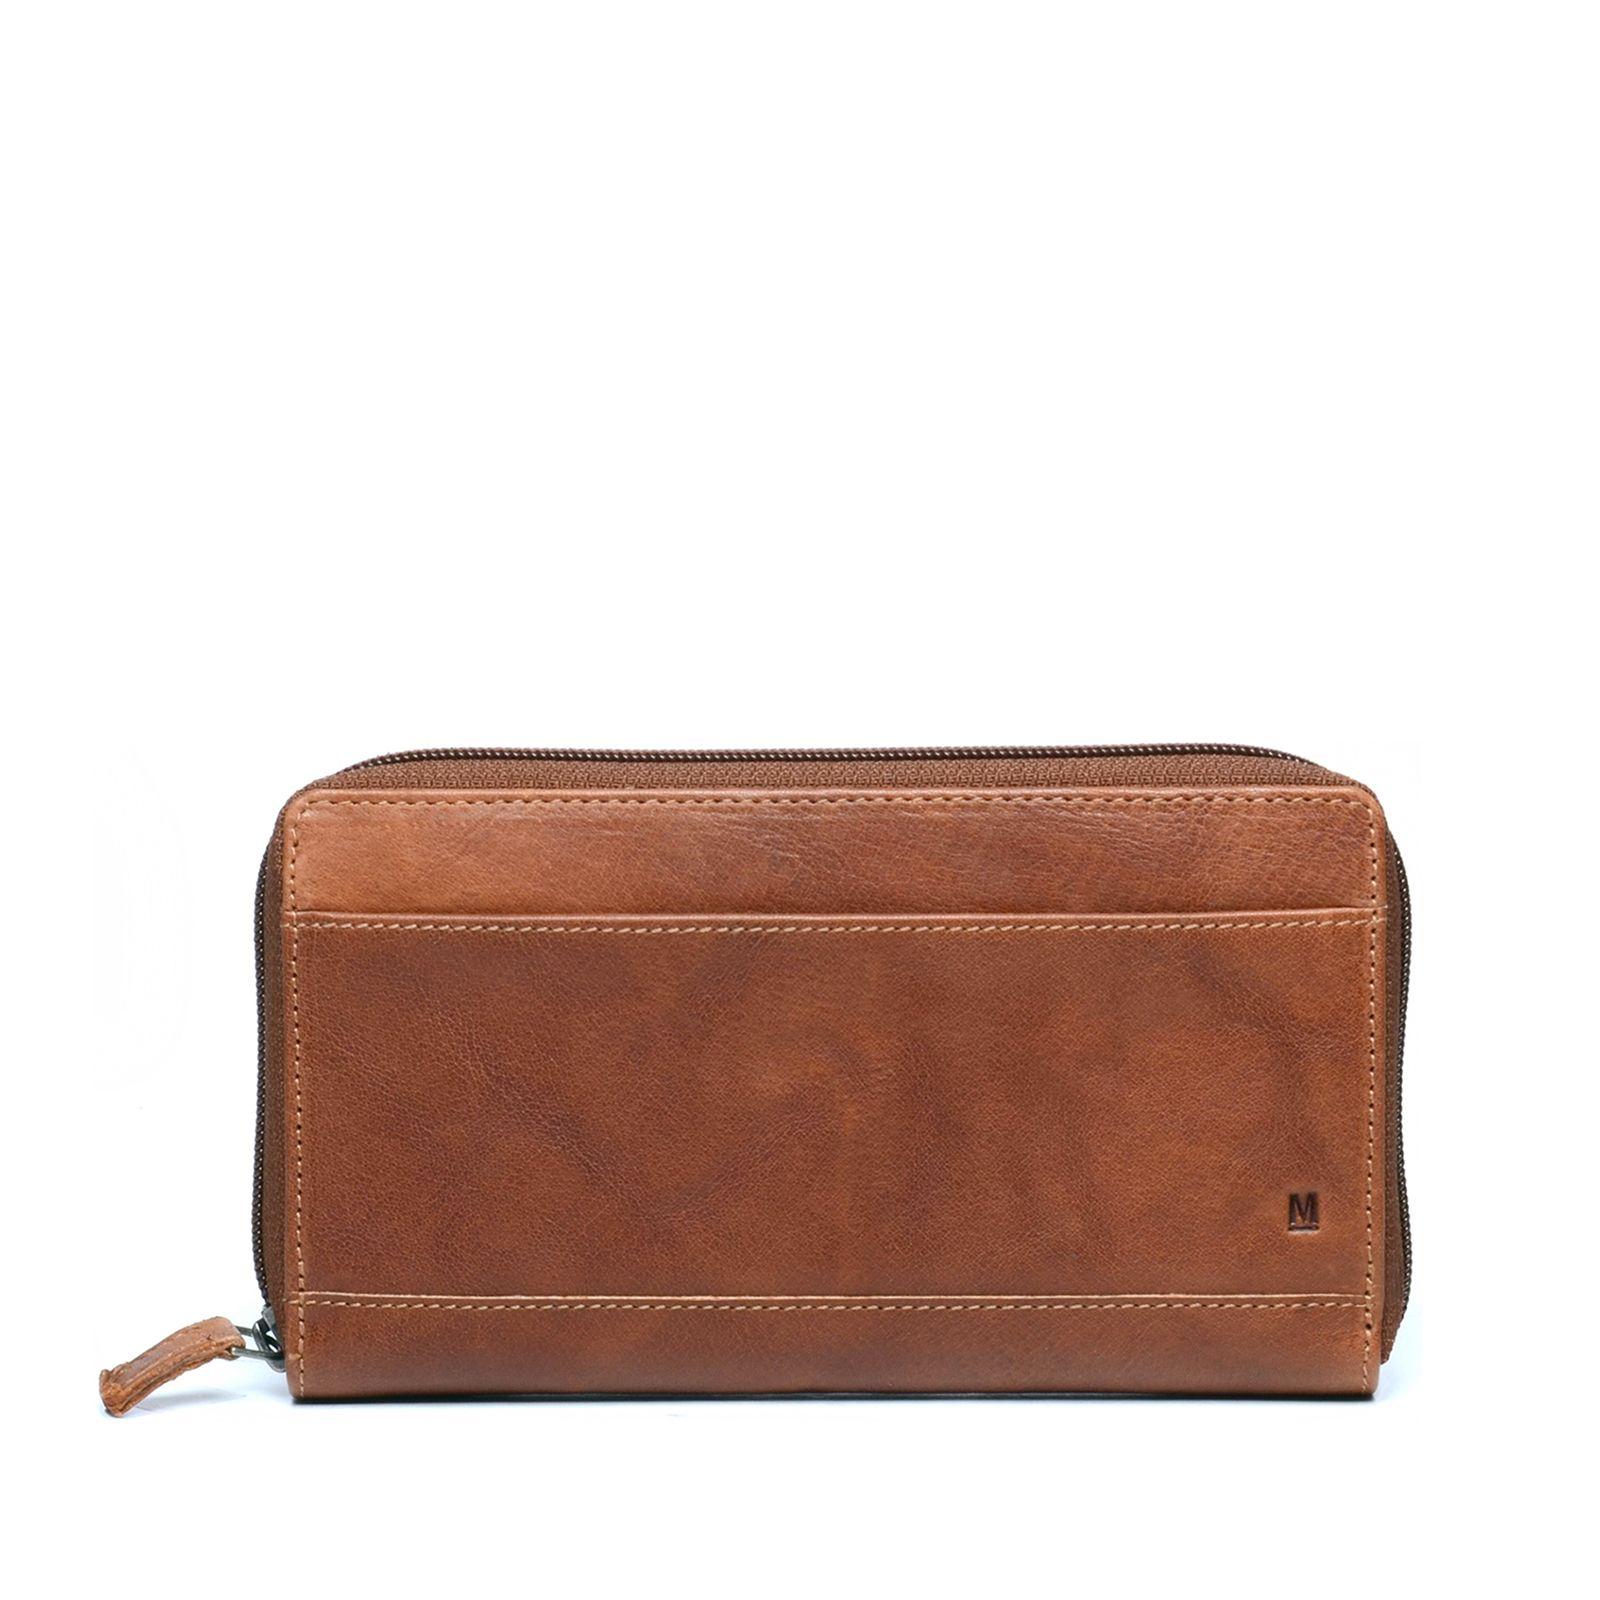 92cdeed38e5 Leren portemonnee cognac - Accessoires | MANFIELD